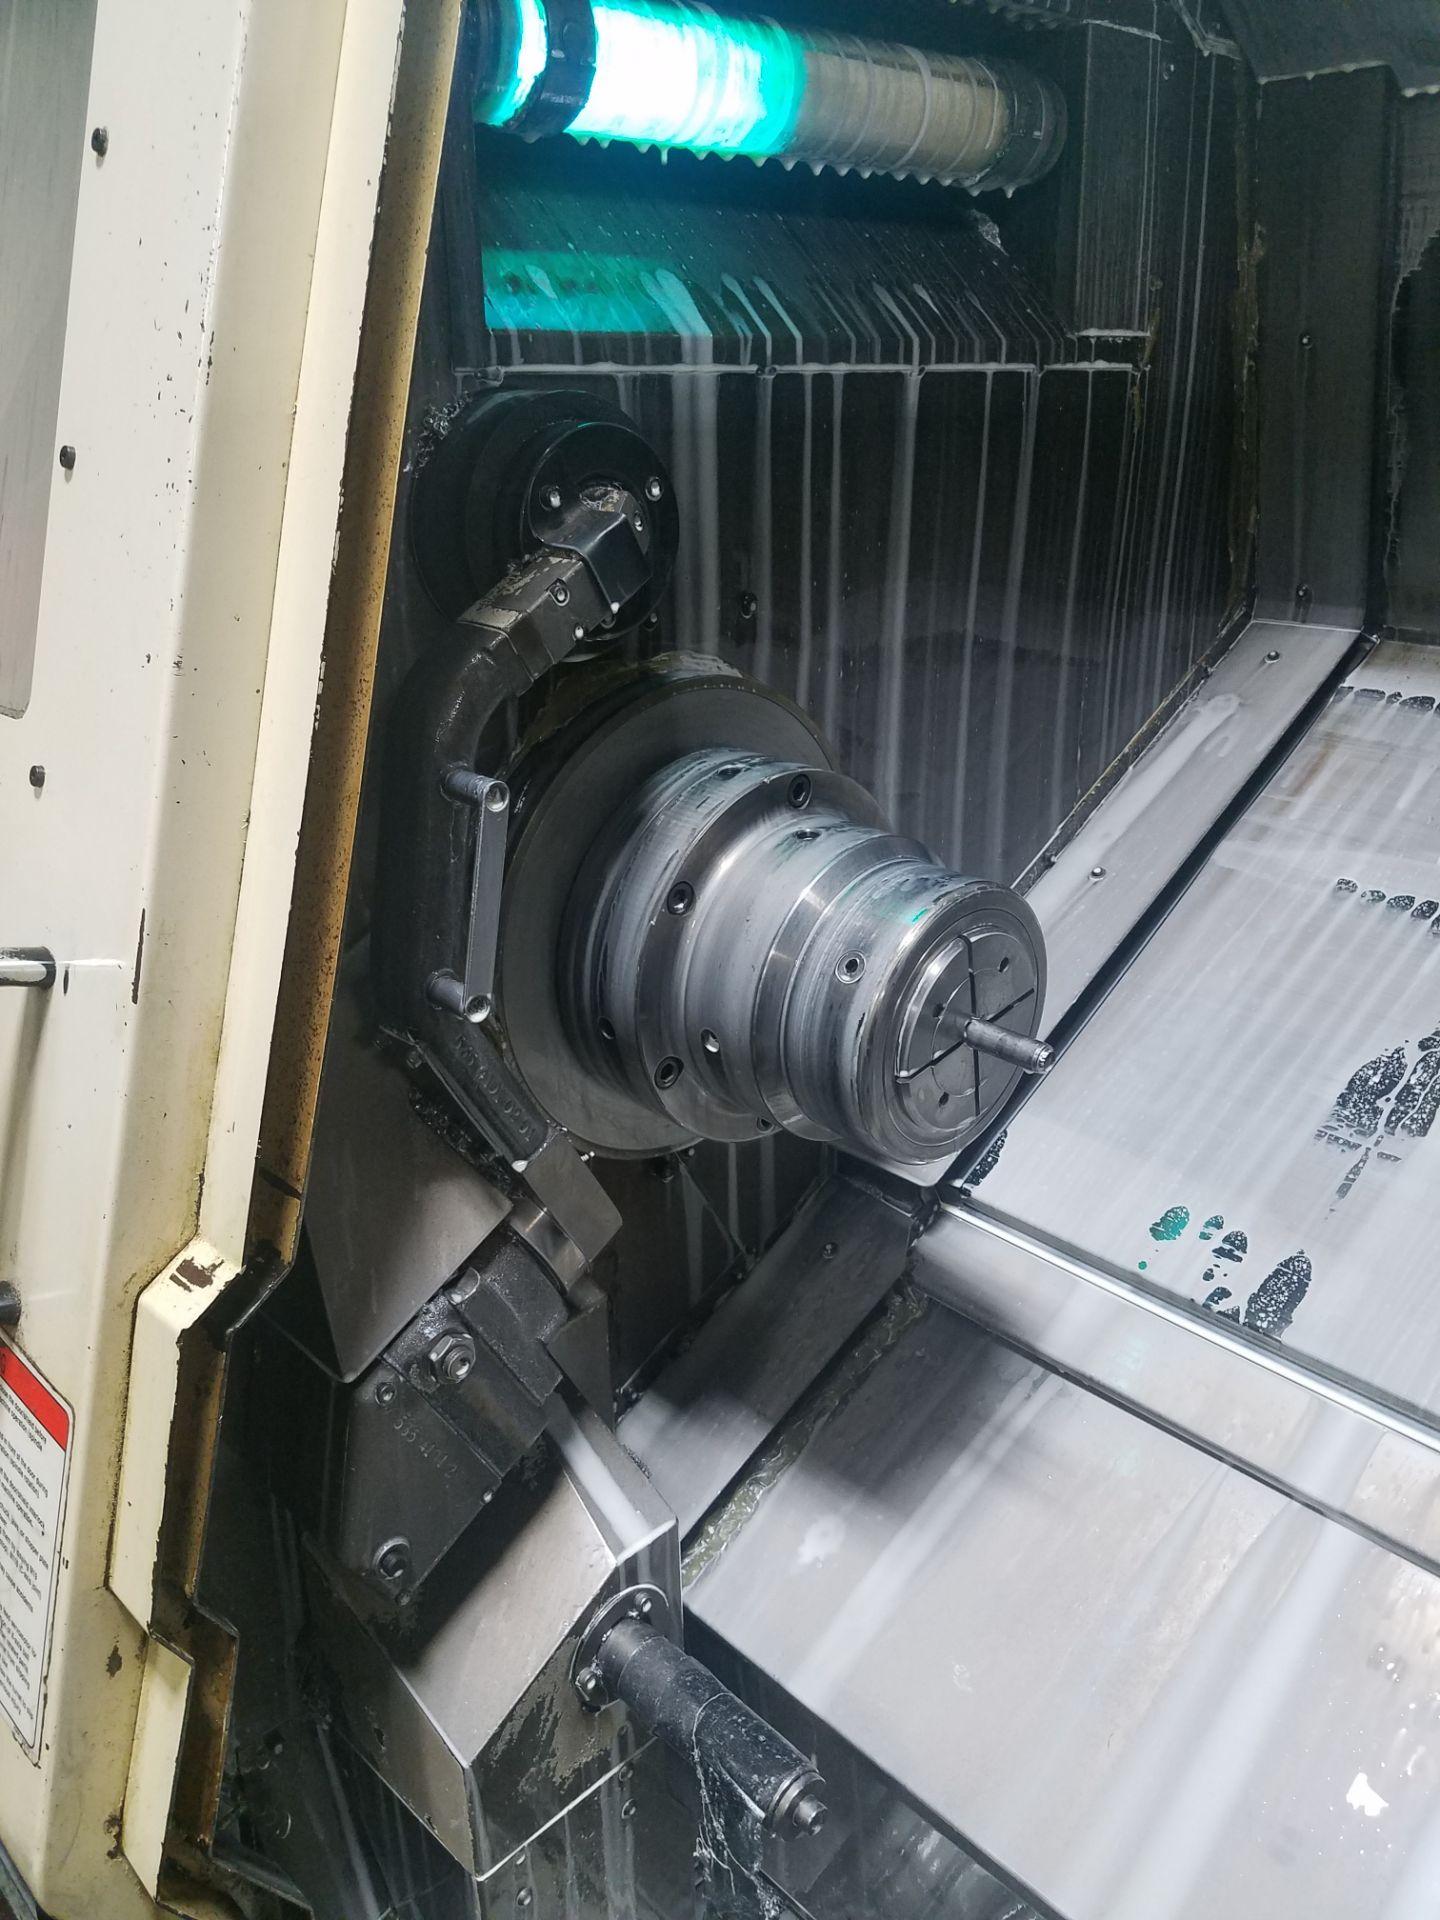 Lotto 26 - Okuma Captain L370 CNC Turning Center, s/n 0019, OSP-E100L CNC Control, Machine Series 780-SB,